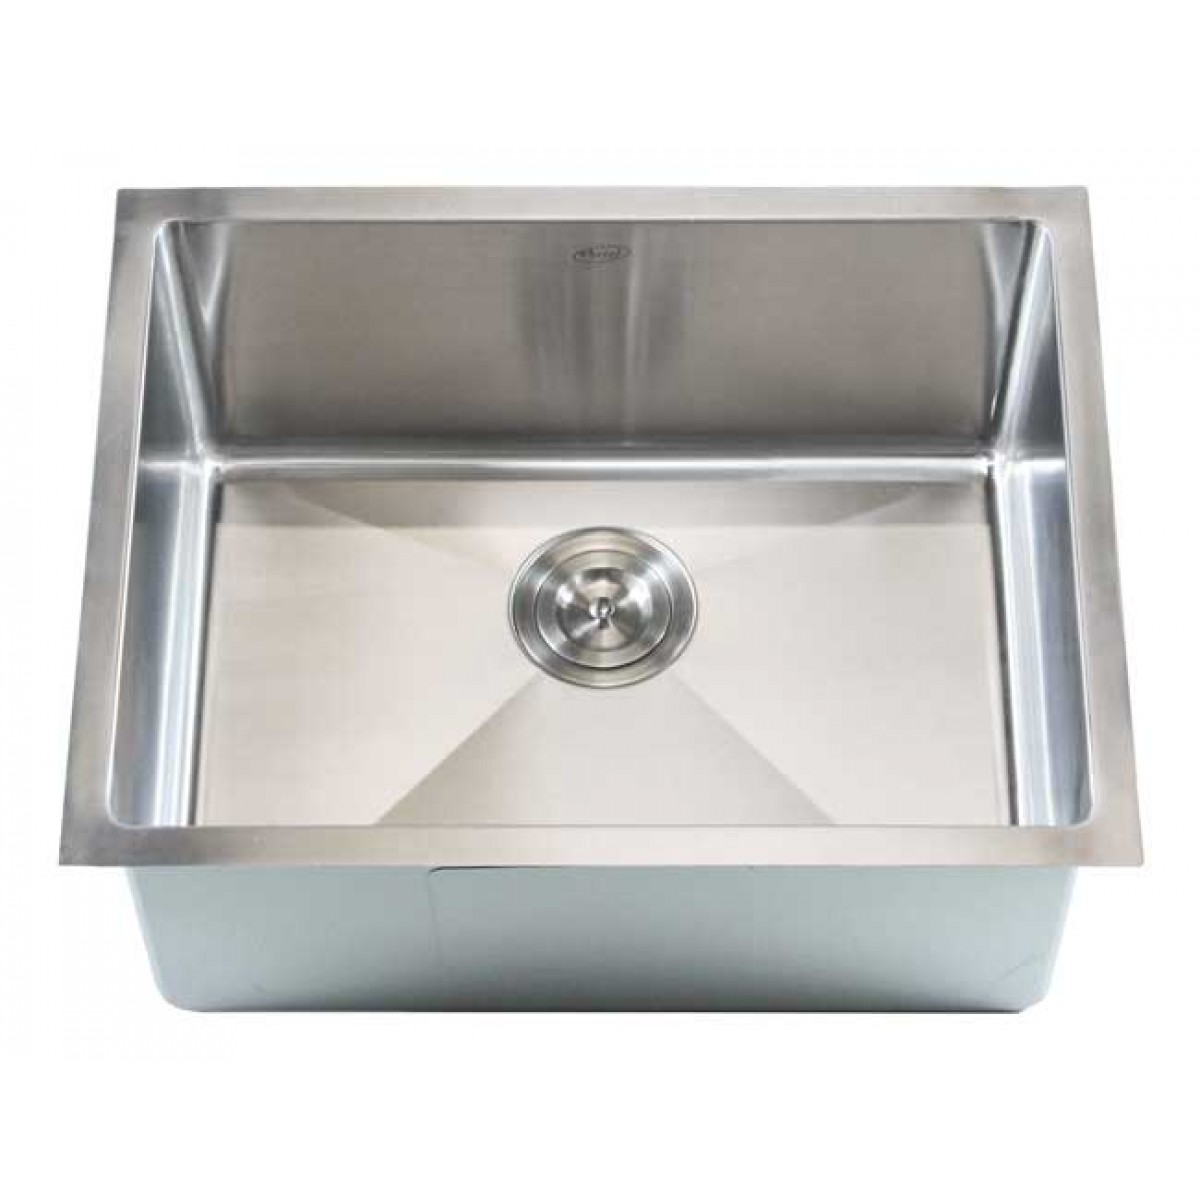 amazon kitchen sinks undermount decorating walls ariel 23 inch stainless steel single bowl